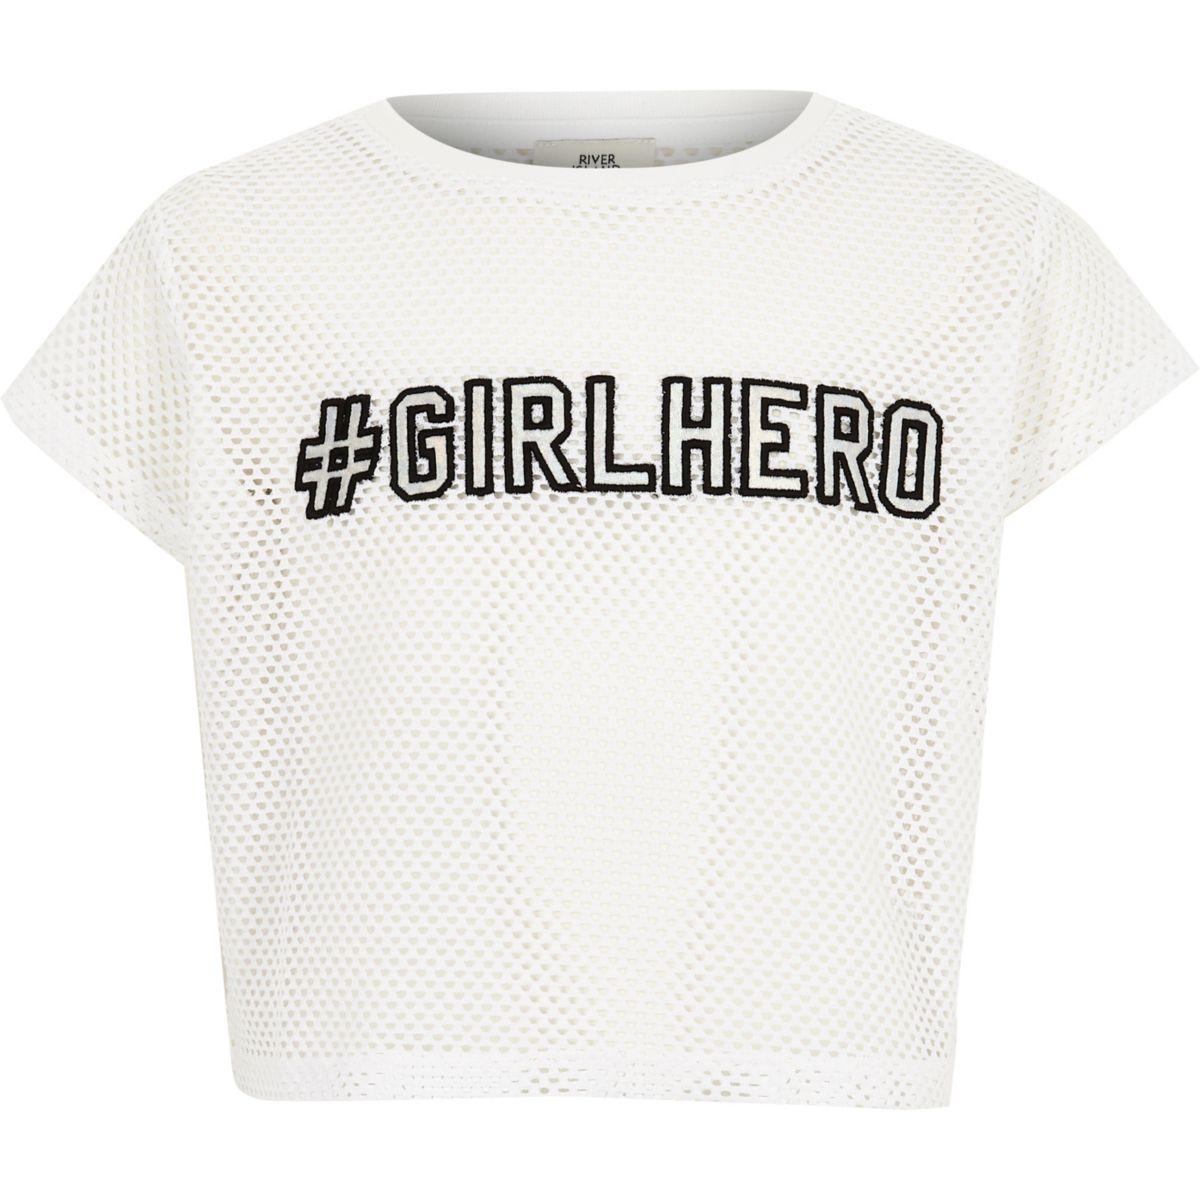 "Weißes T-Shirt ""girl hero"""